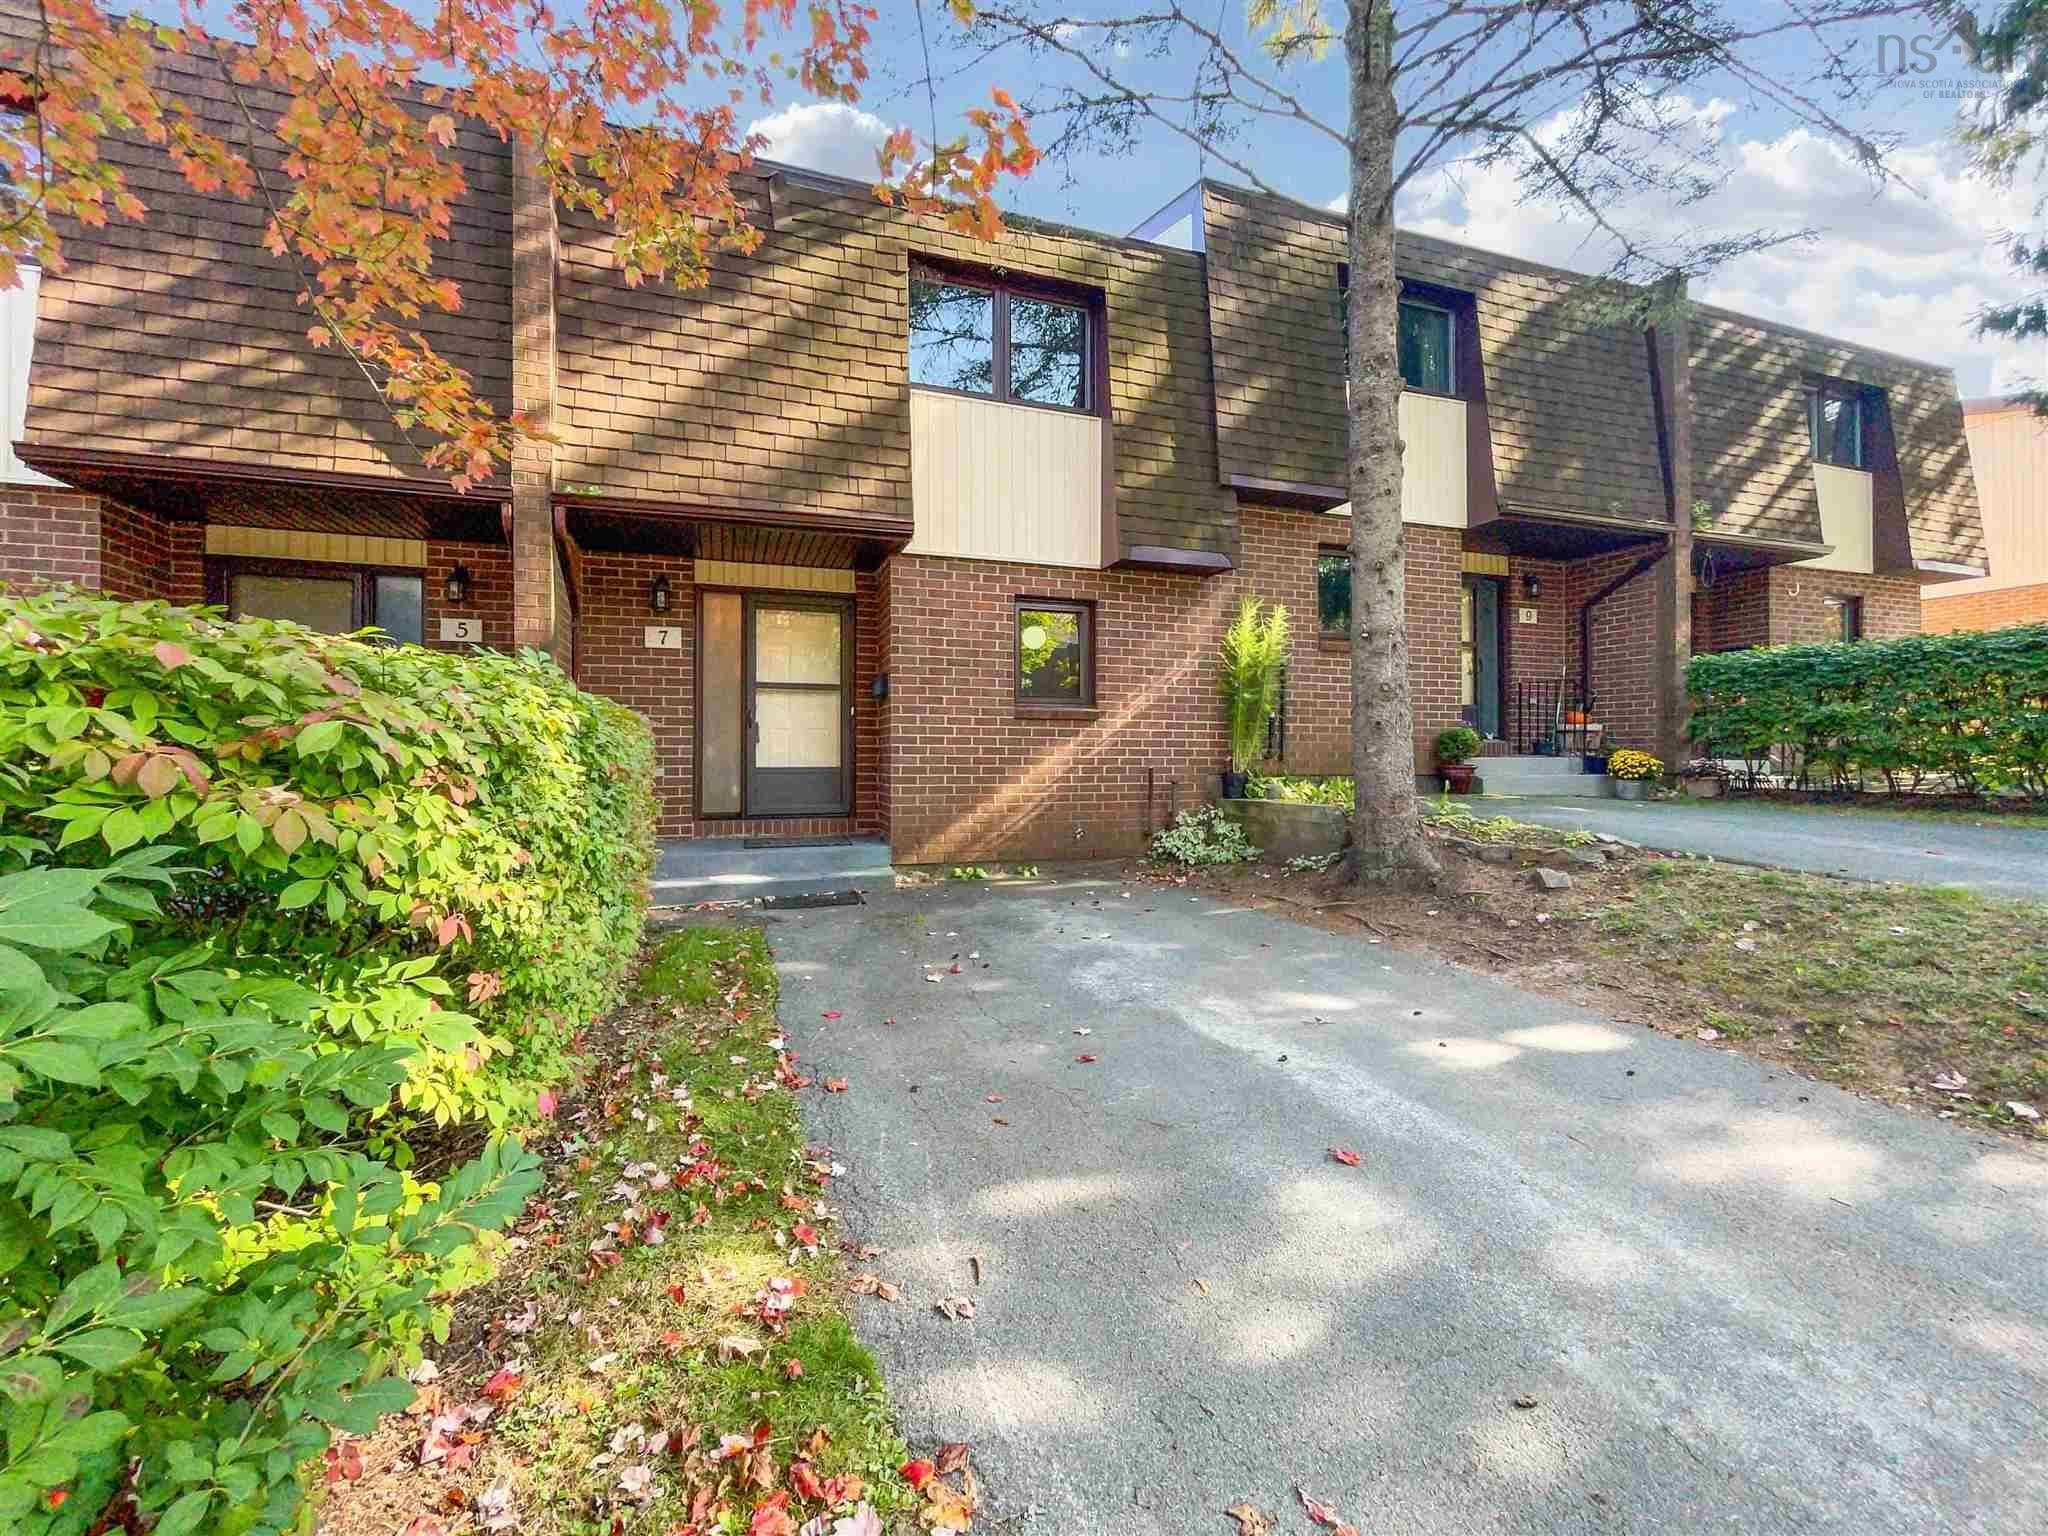 Main Photo: 7 Chelsea Lane in Halifax: 5-Fairmount, Clayton Park, Rockingham Residential for sale (Halifax-Dartmouth)  : MLS®# 202125418